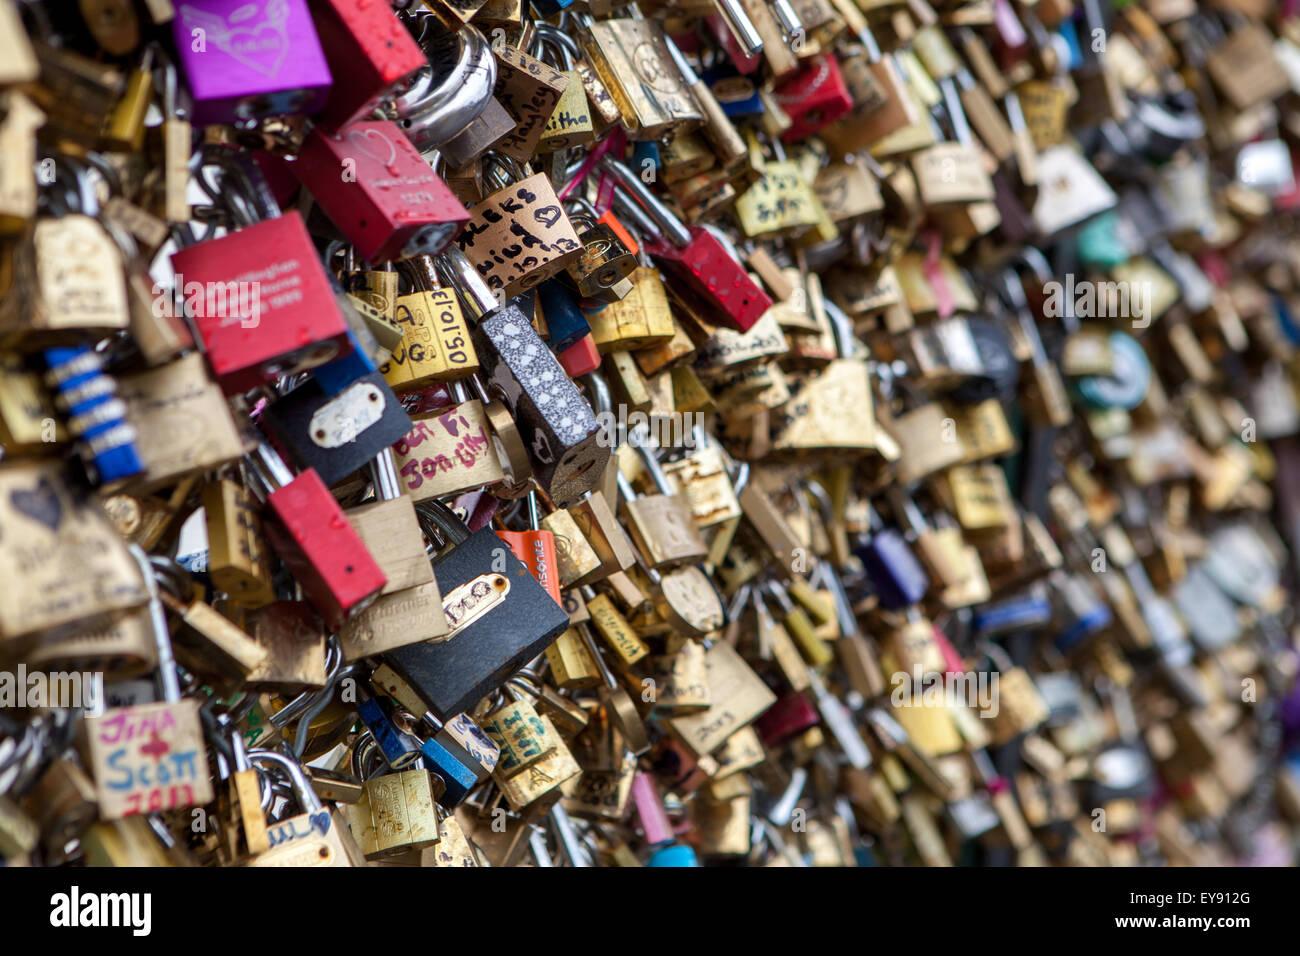 Love locks on a bridge in Paris. - Stock Image